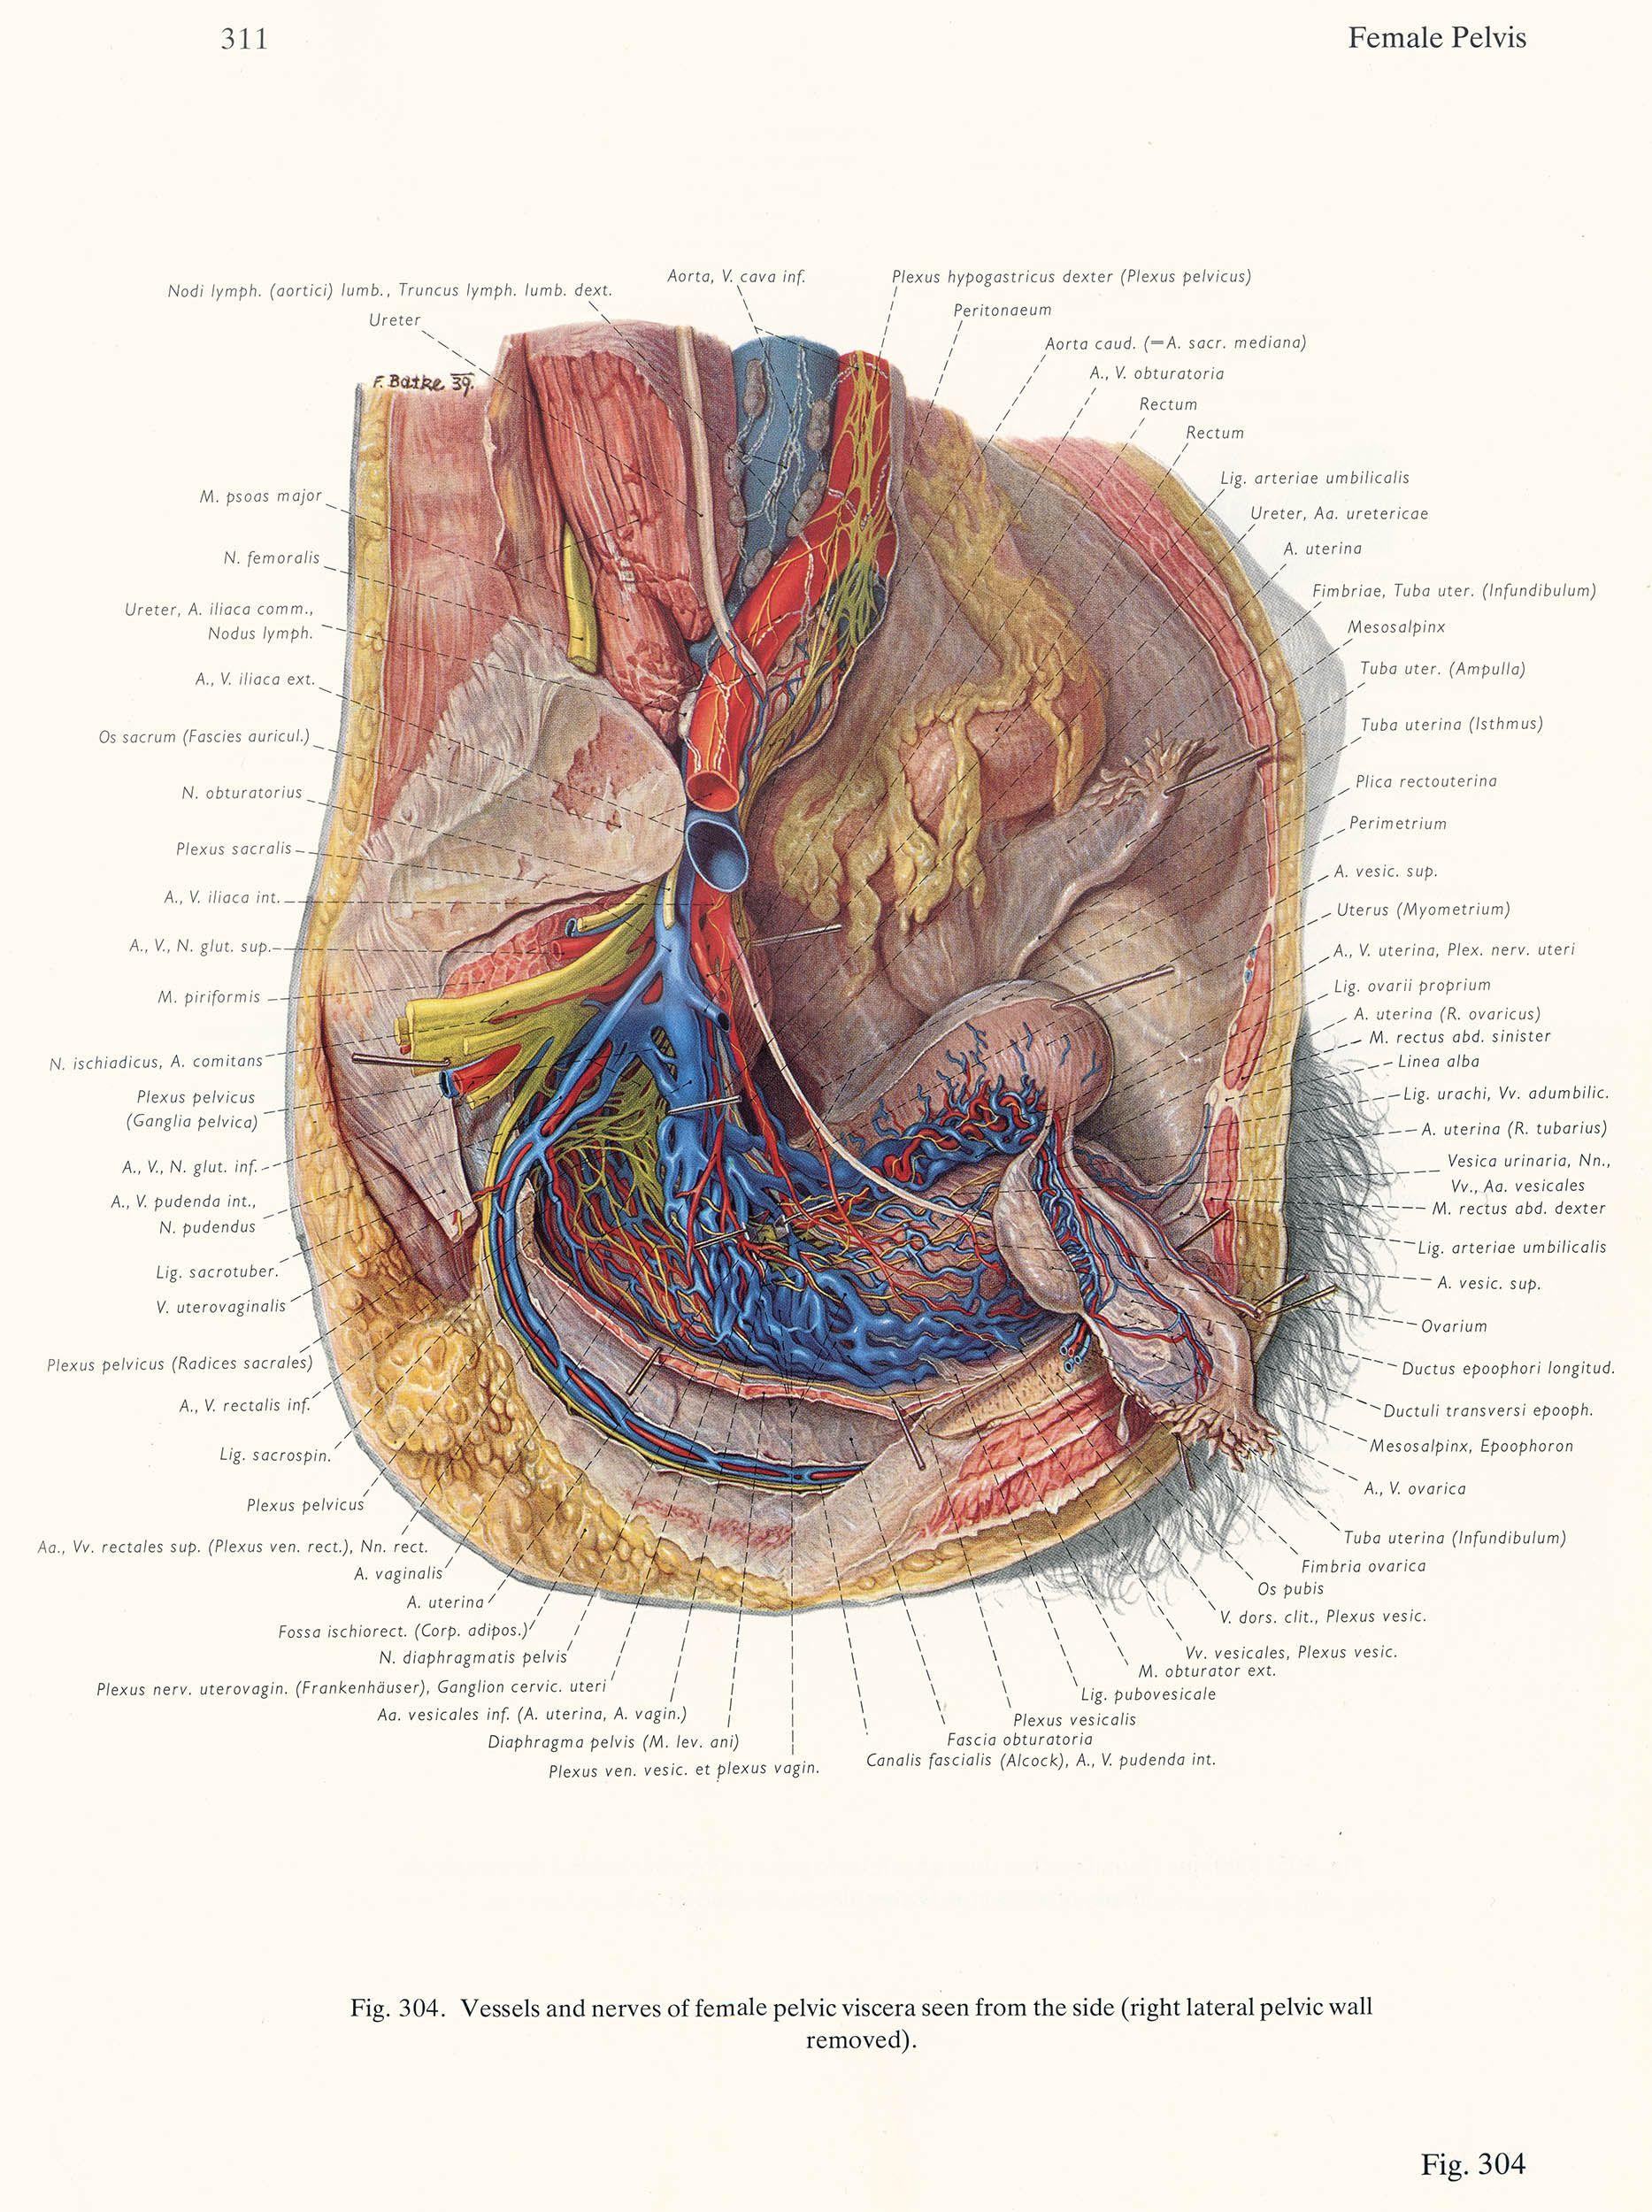 Vessels And Nerves Of The Female Pelvis Franz Batke Click For